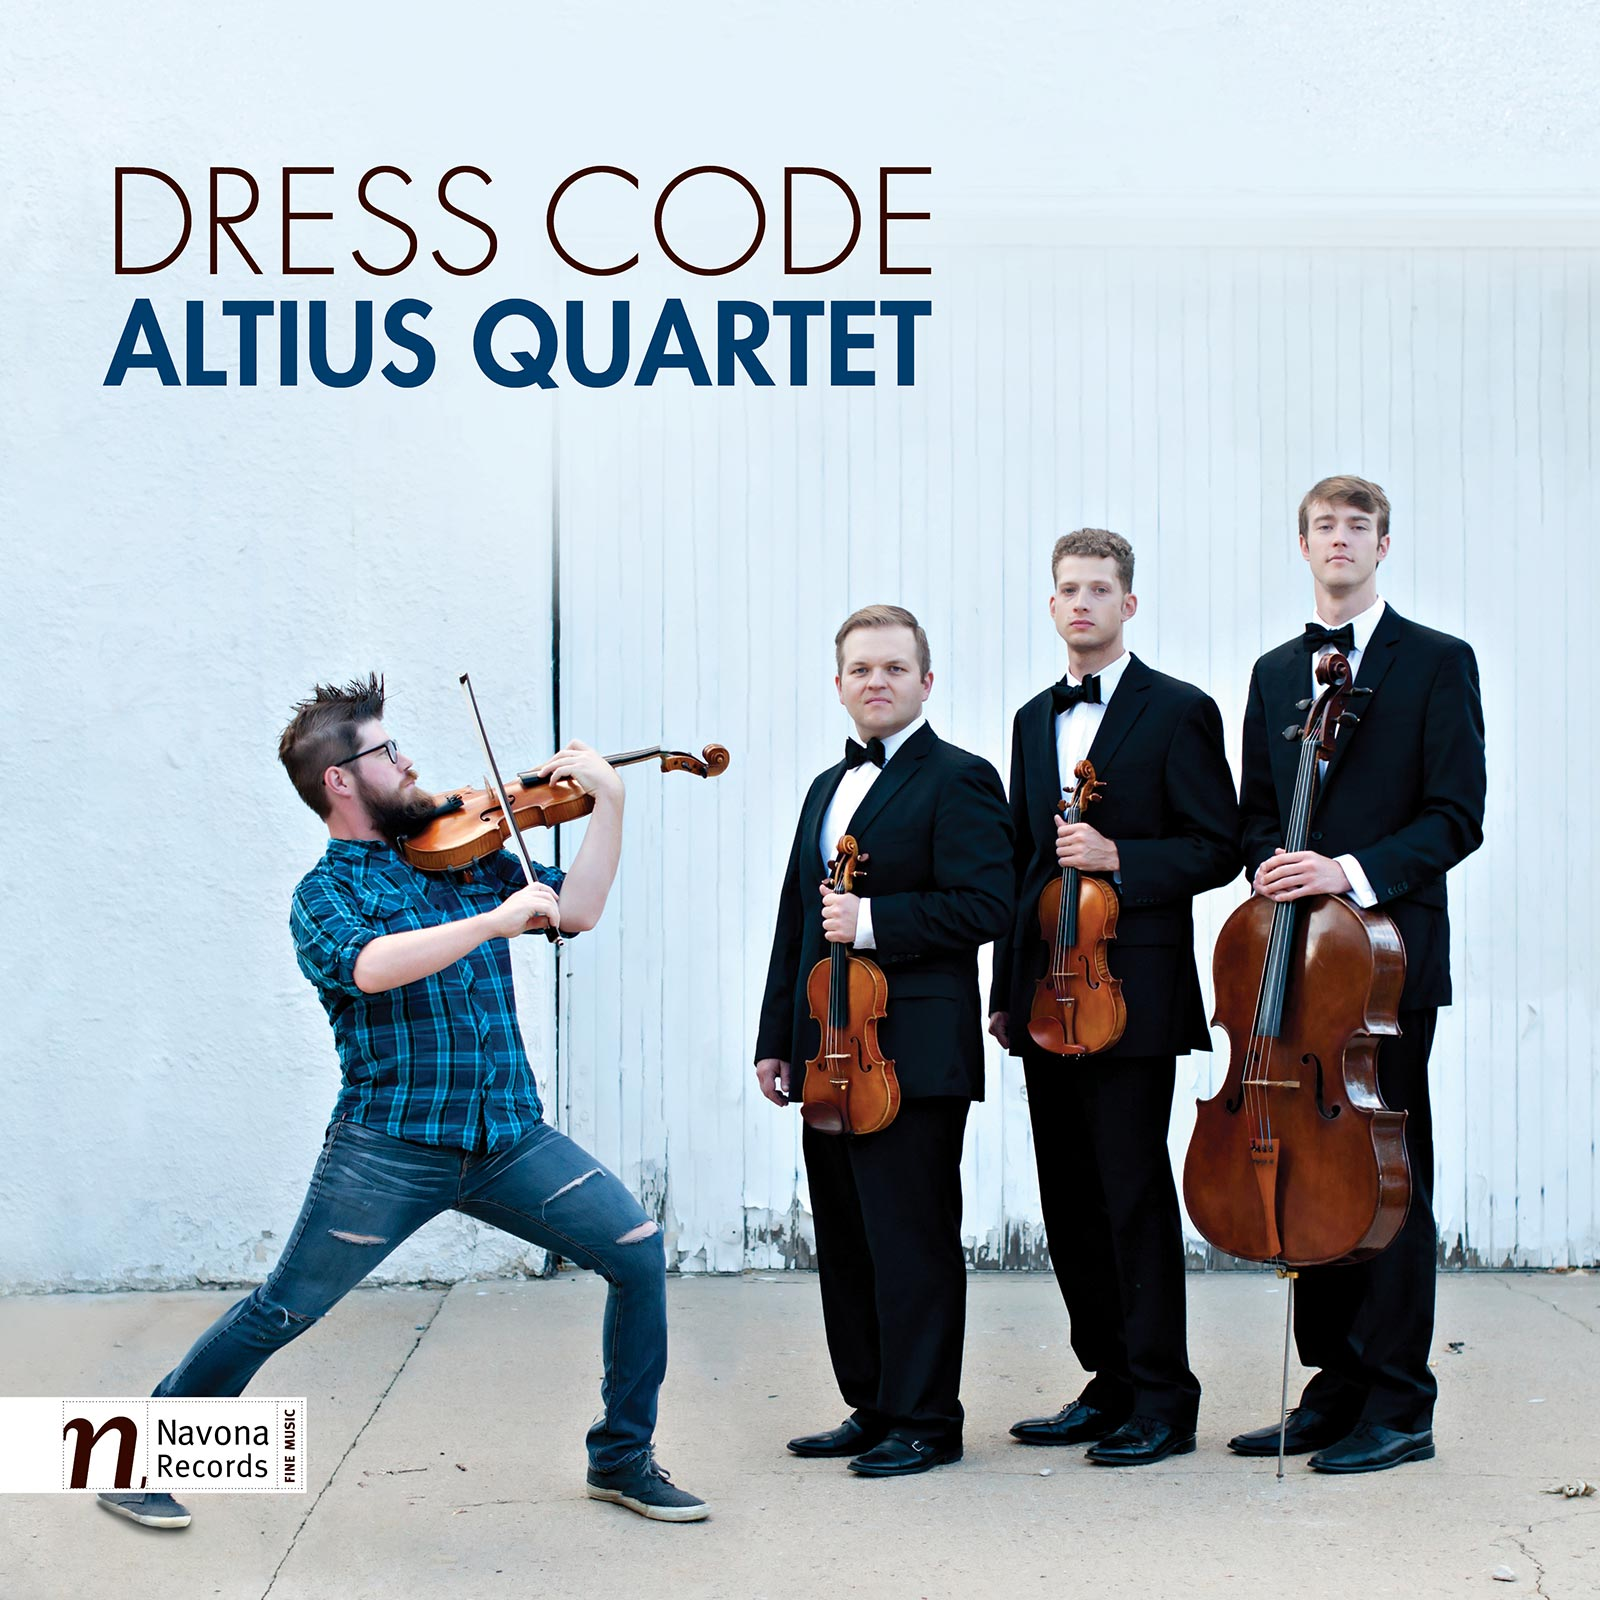 DRESS CODE - Album Cover